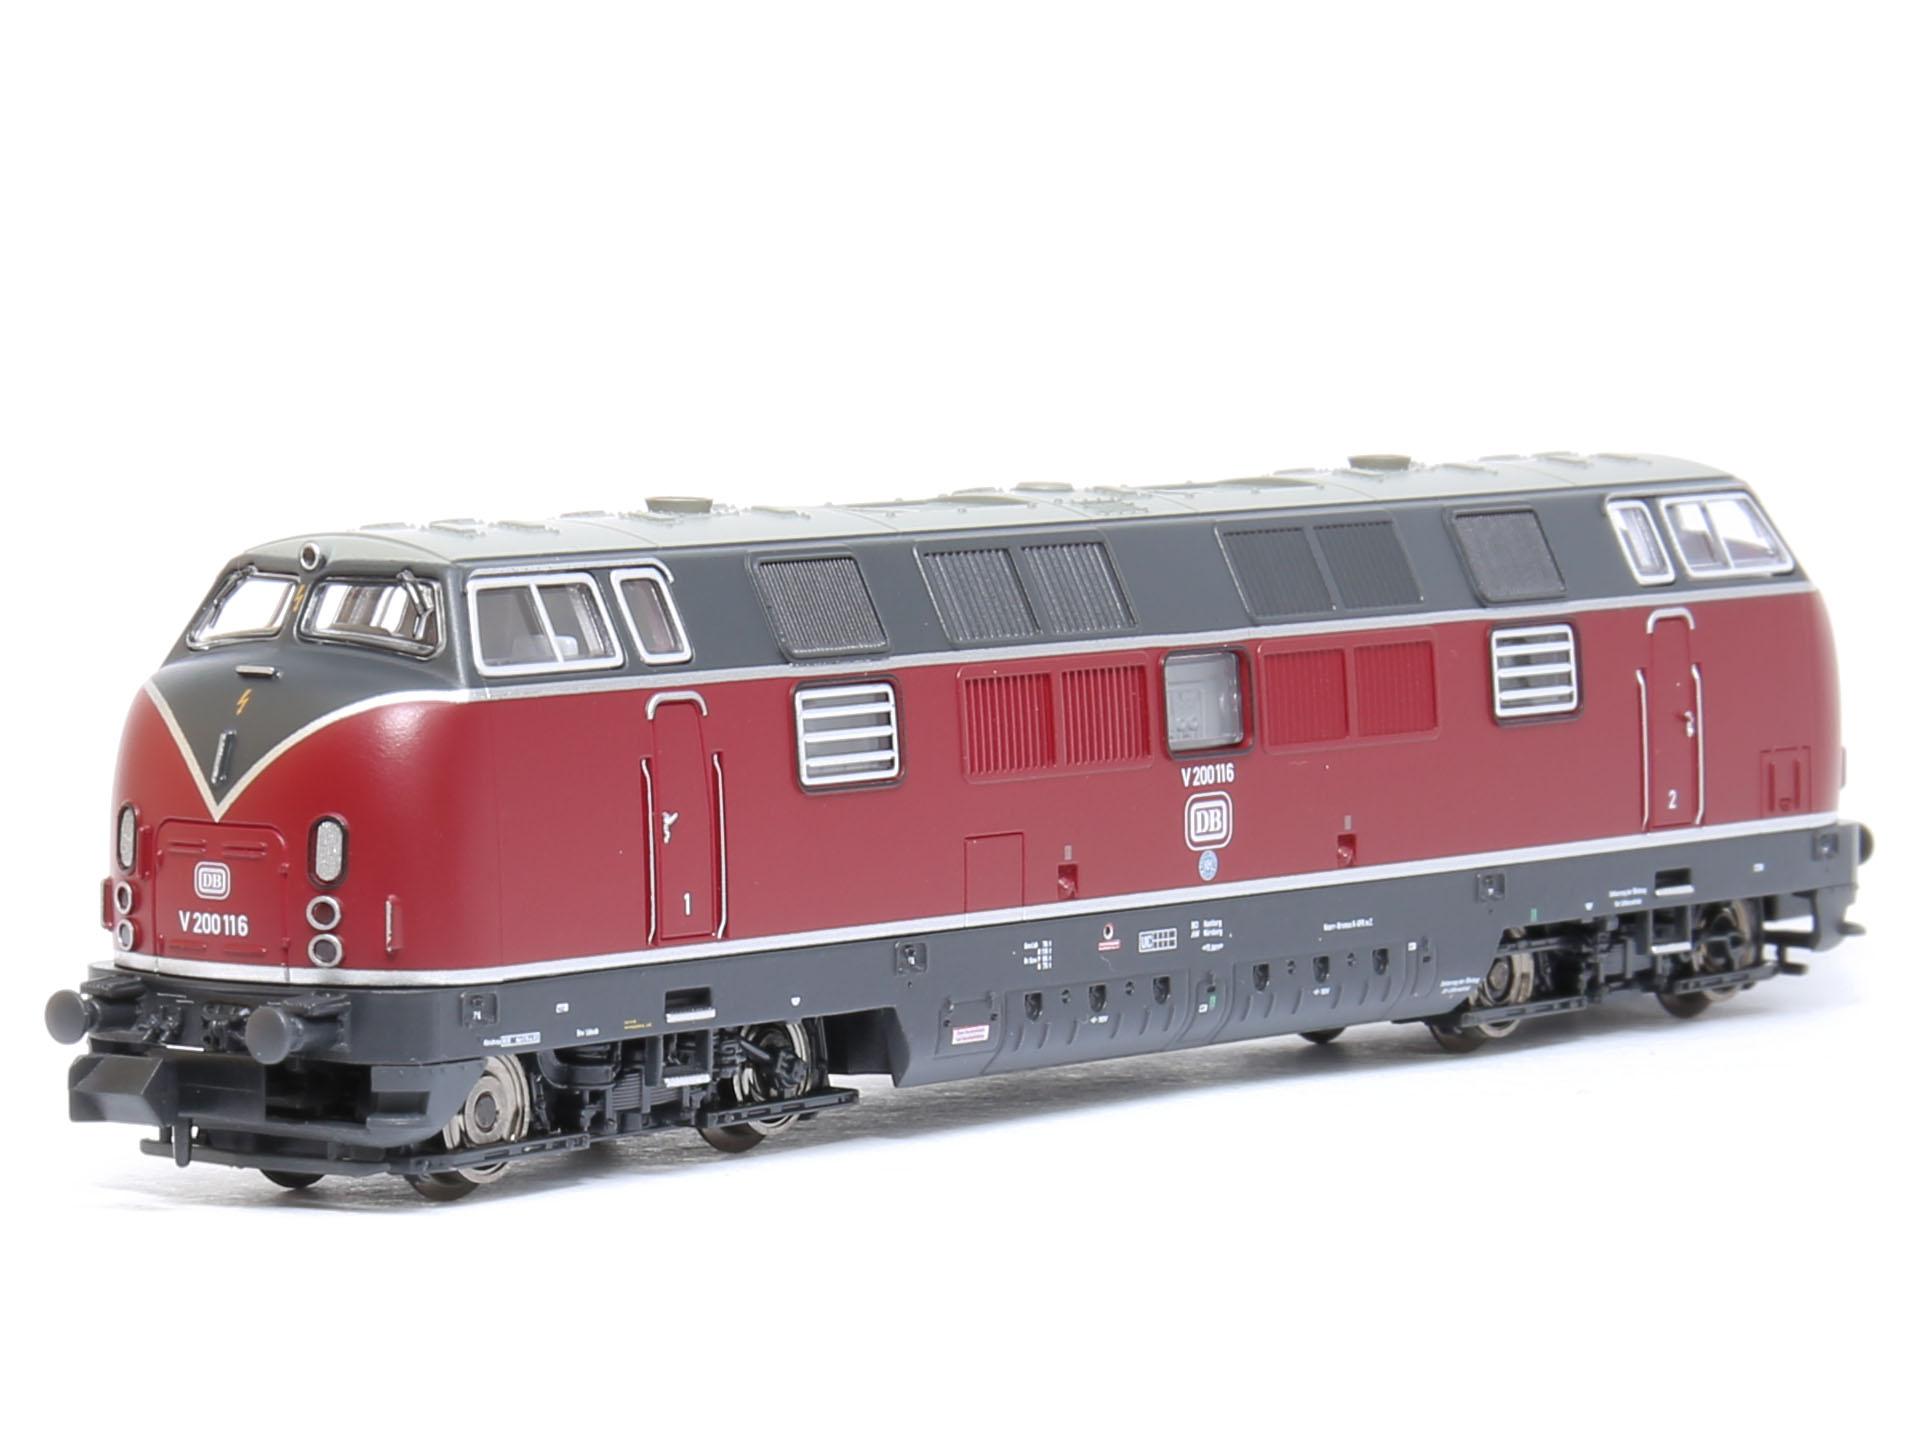 Piko 40503 Dcc Sx Sound Diesel Locomotive V 200 1 Db Ep Iii 1 160 Dm Toys